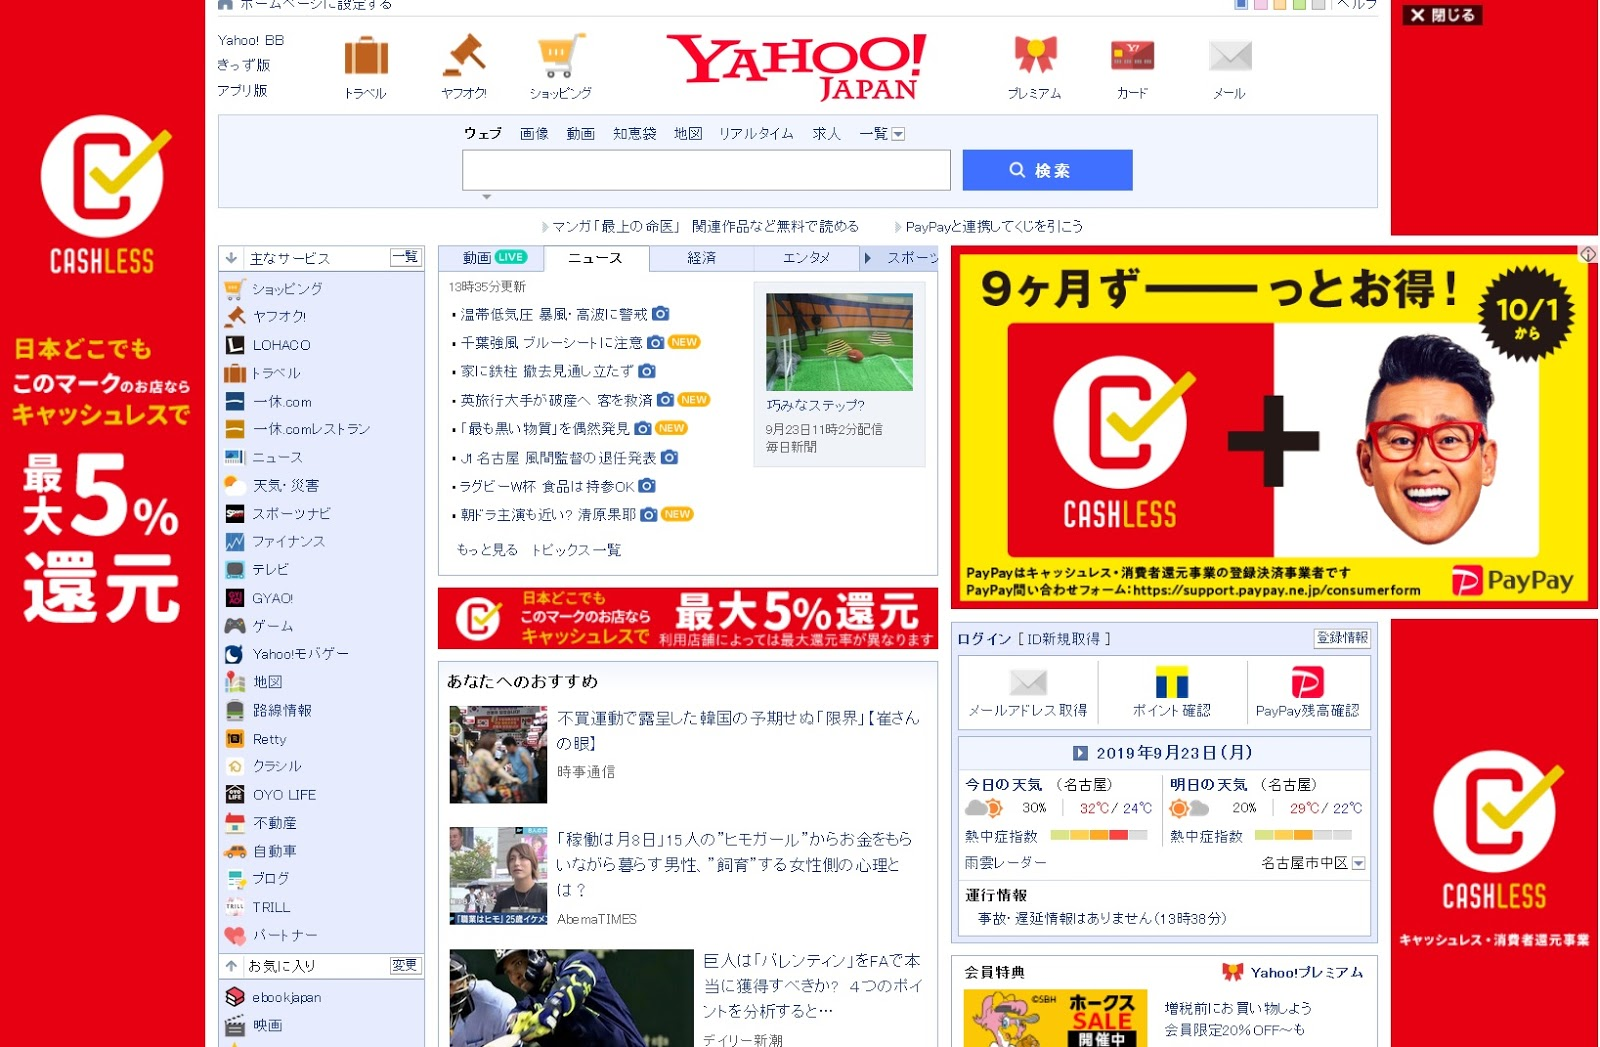 Yahooブランドパネル